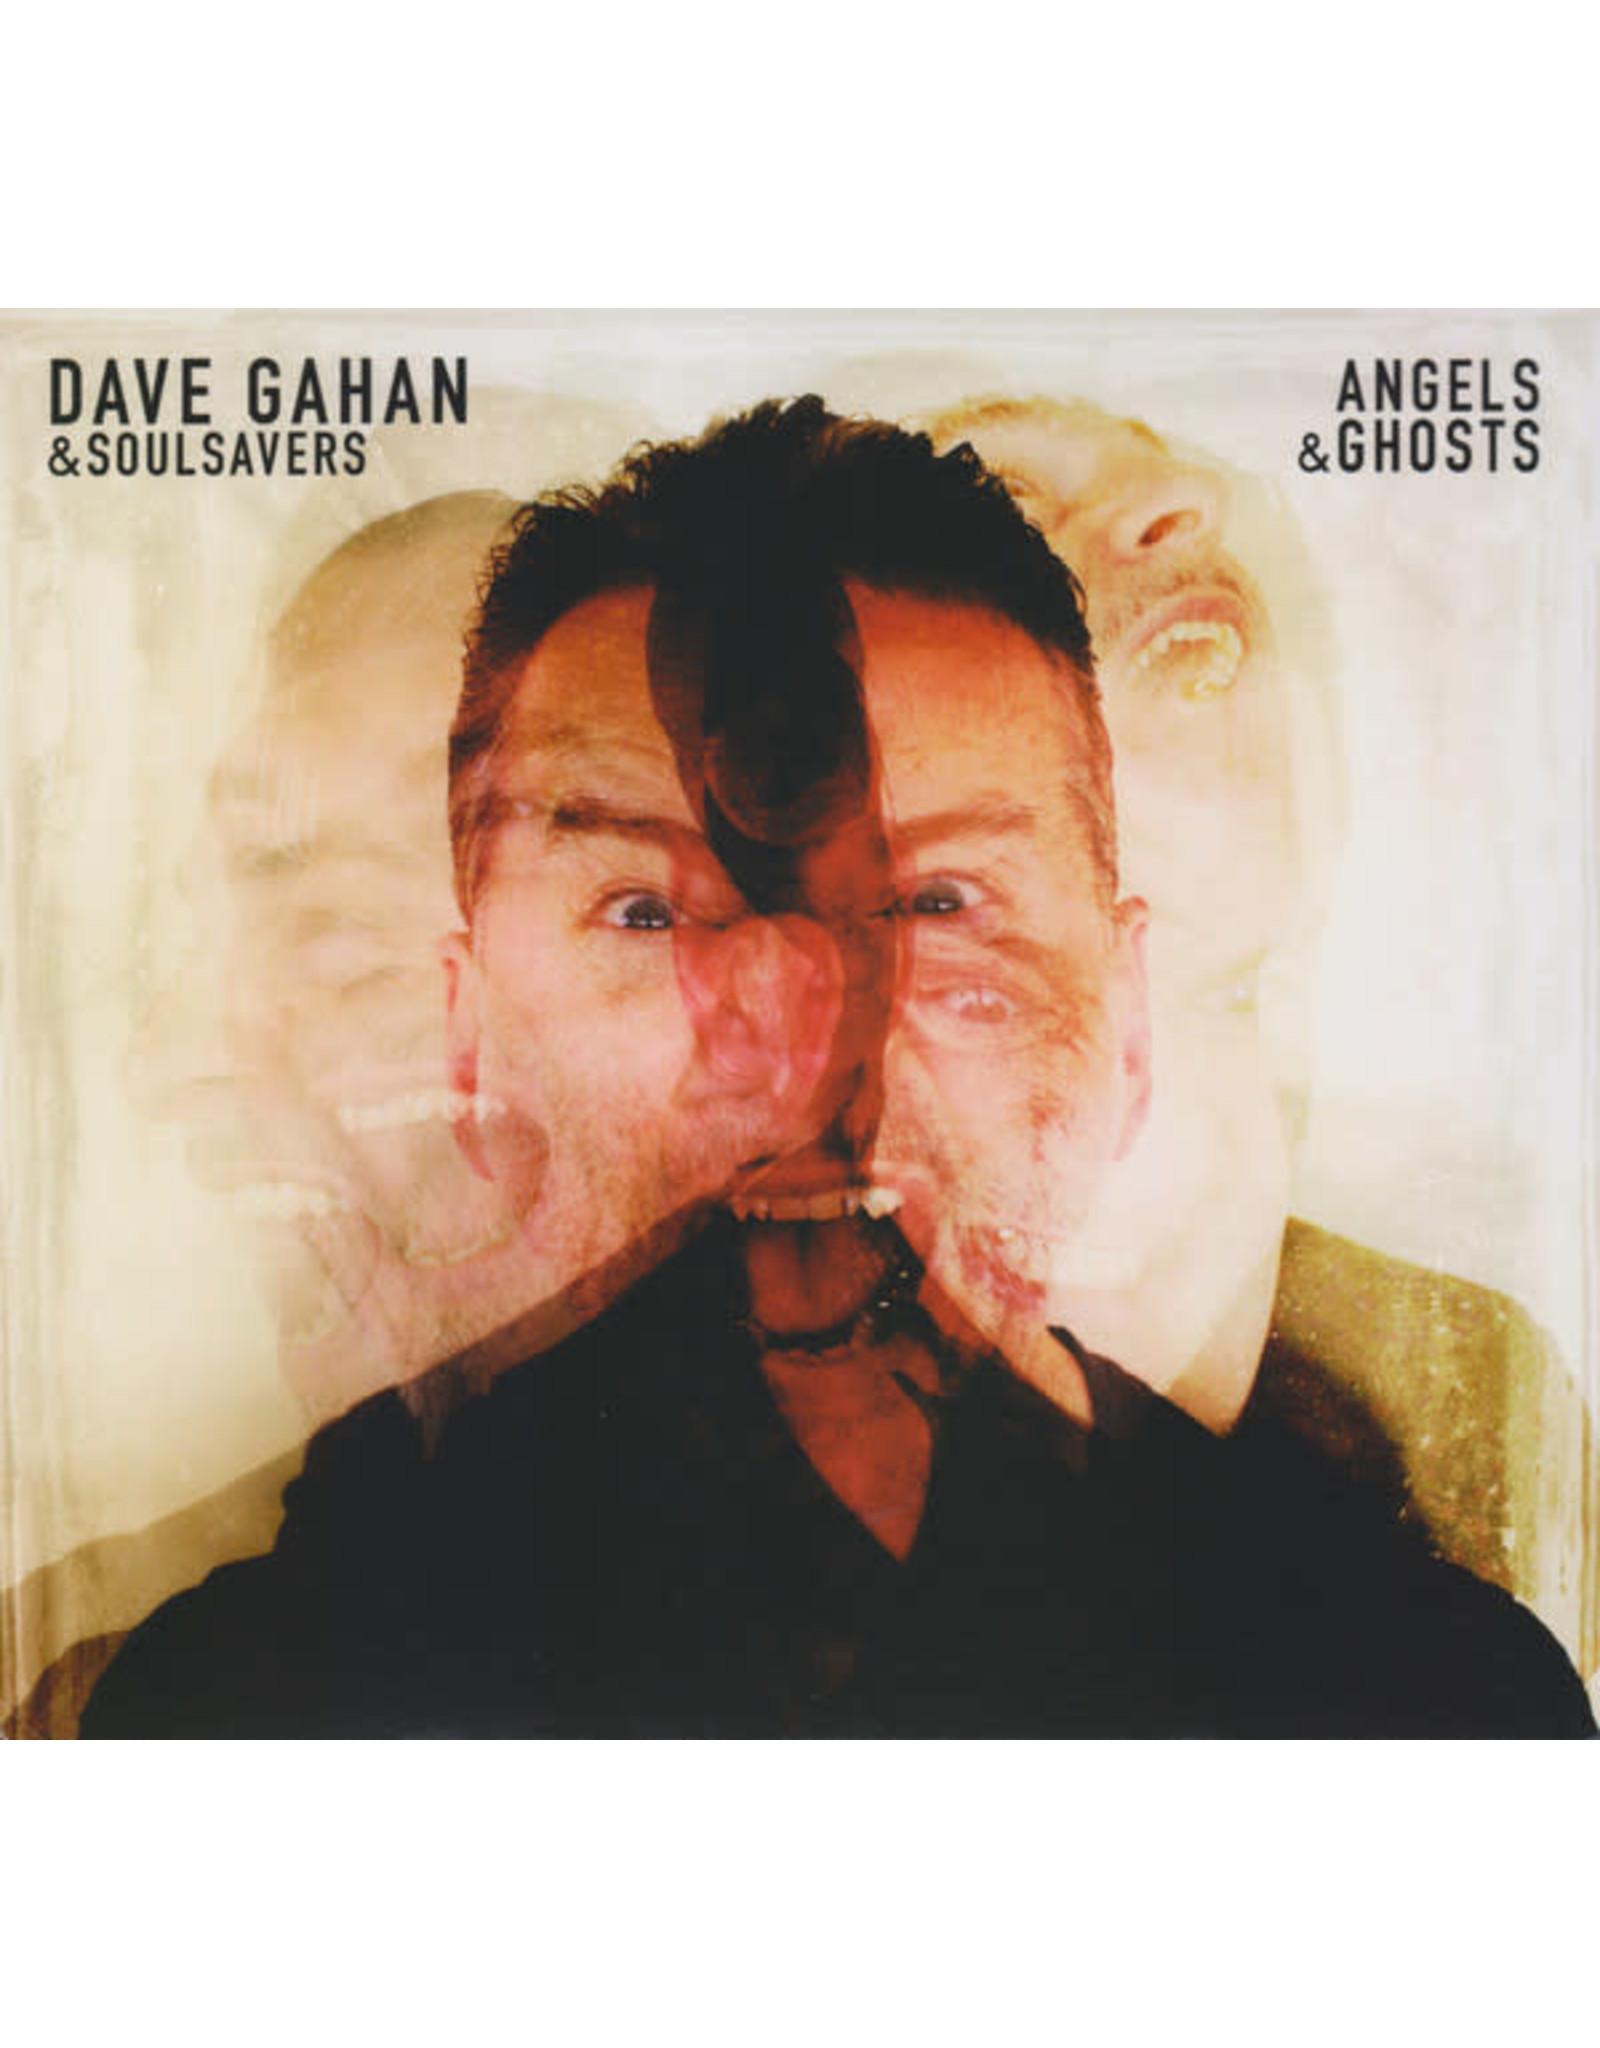 Gahan, Dave & Soul Savers - Angels & Ghosts CD